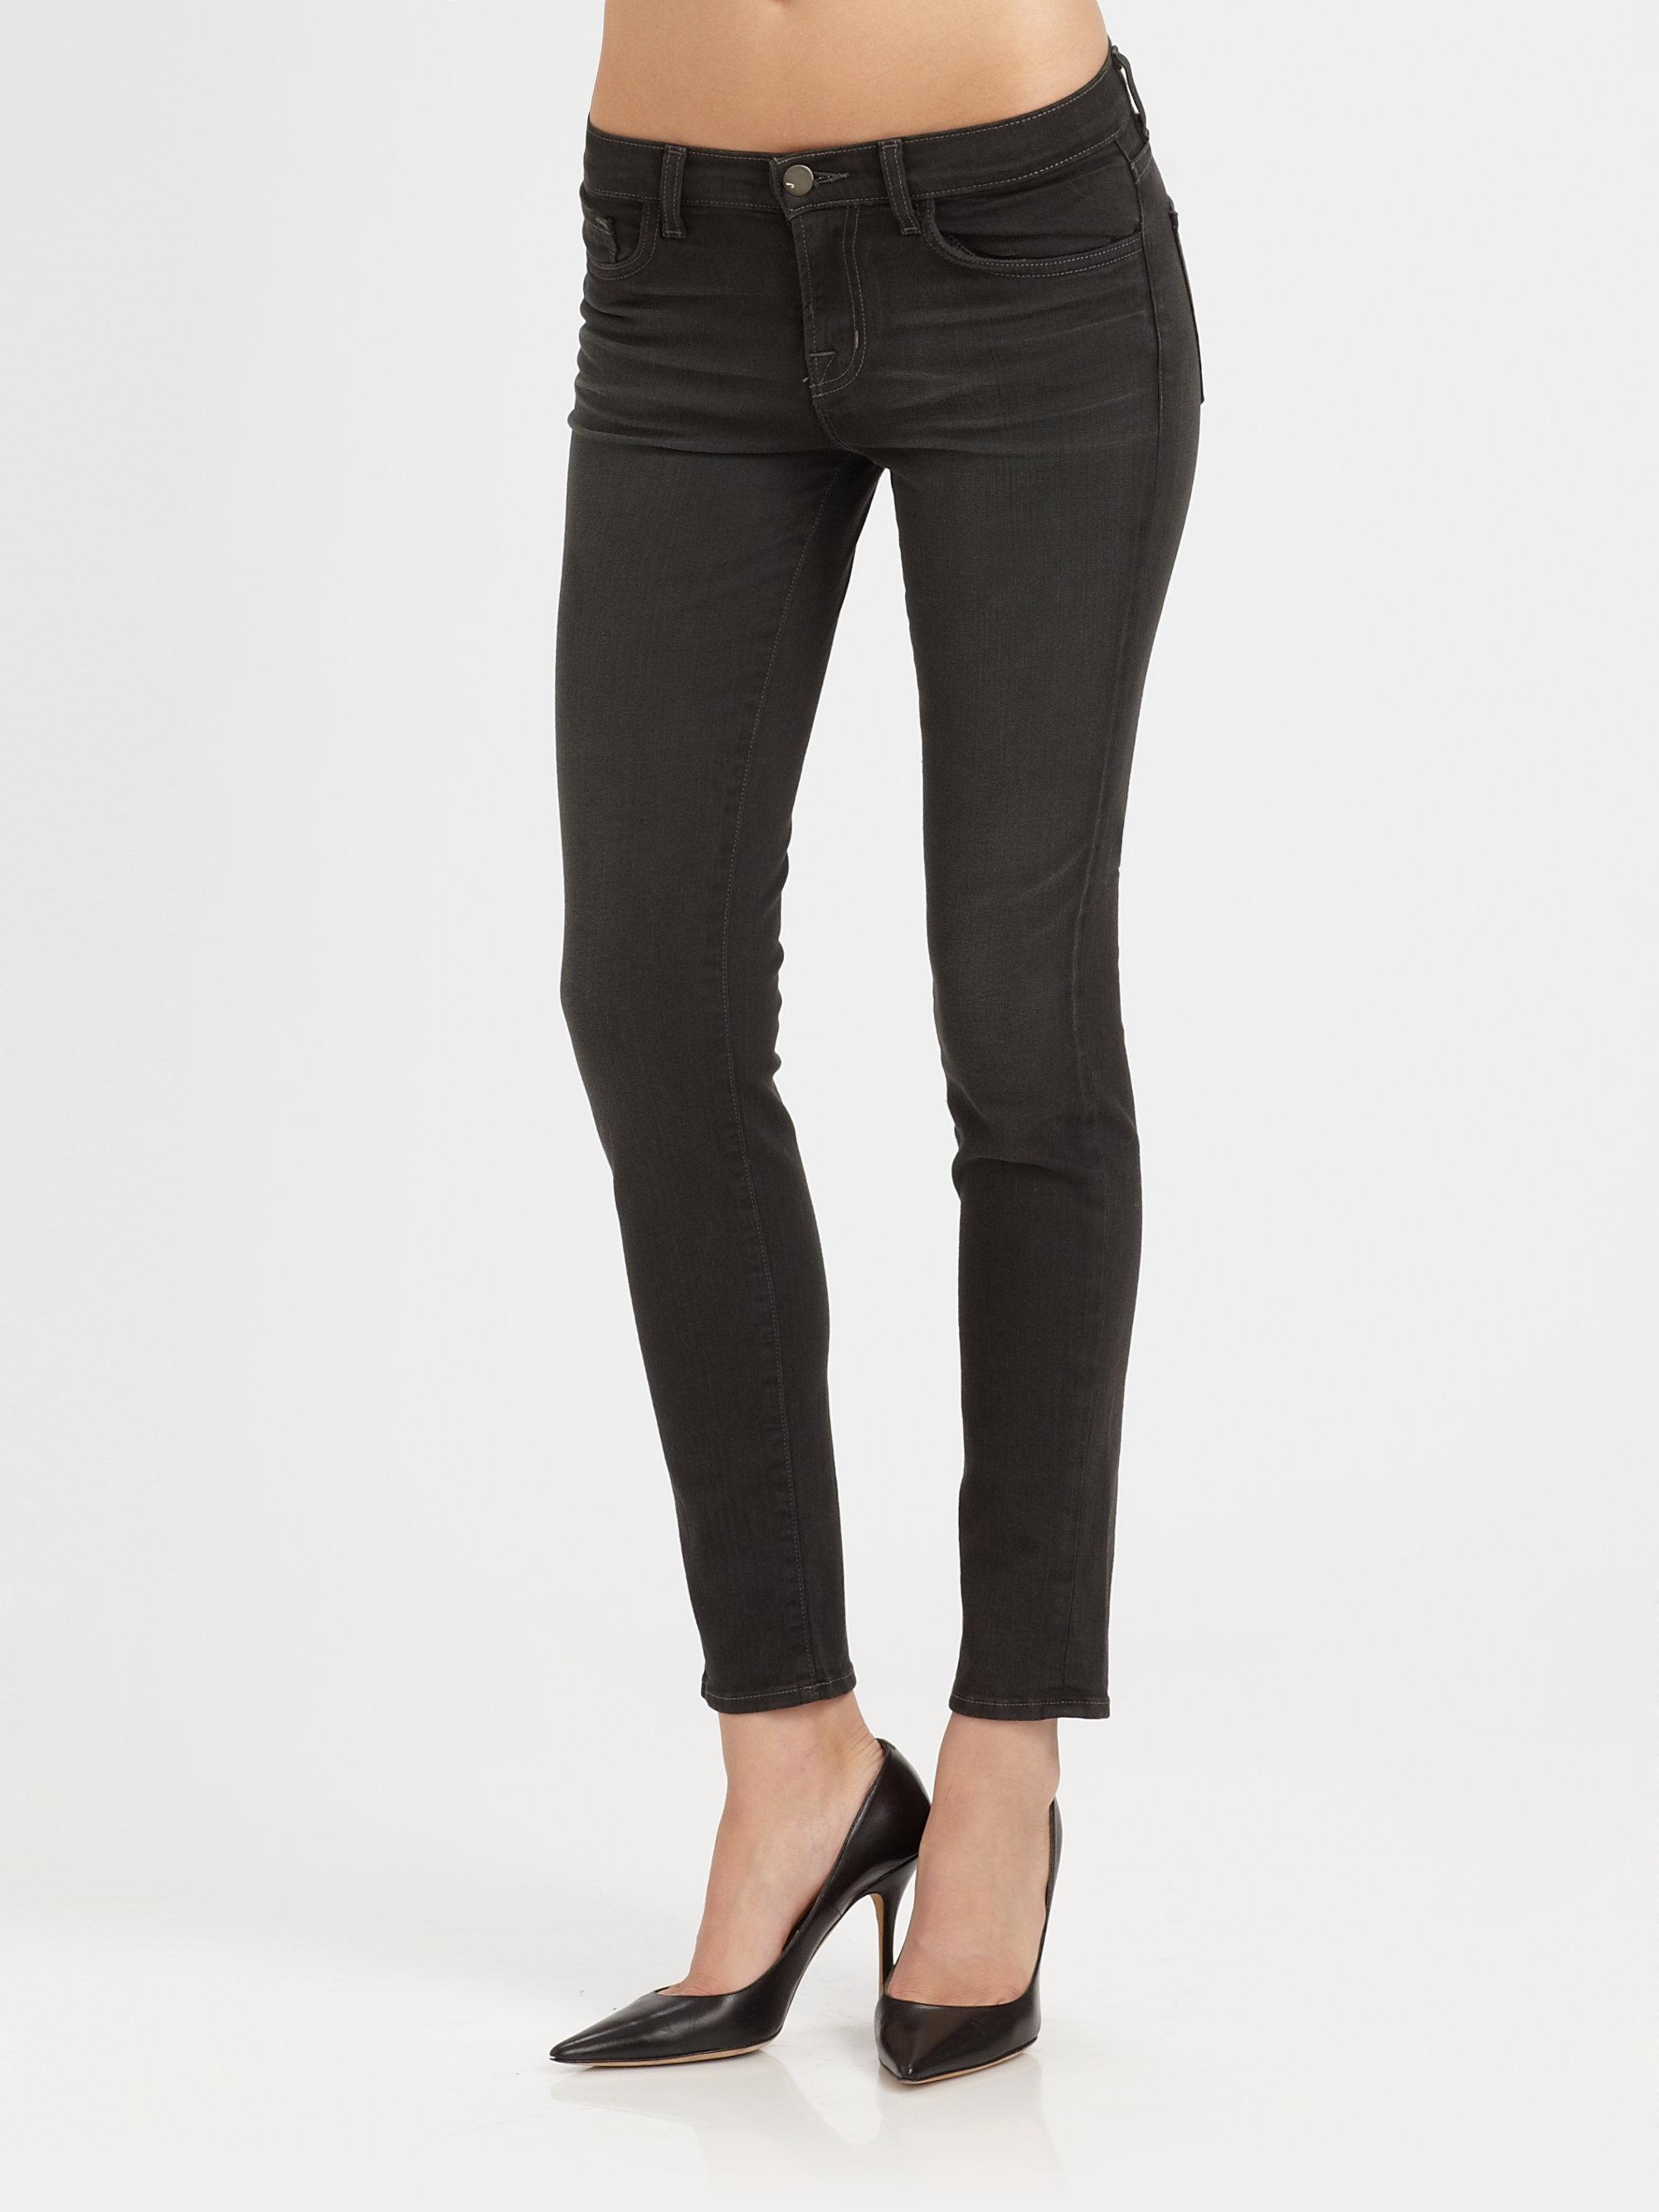 j brand 811 midrise skinny jeans in black dare lyst. Black Bedroom Furniture Sets. Home Design Ideas